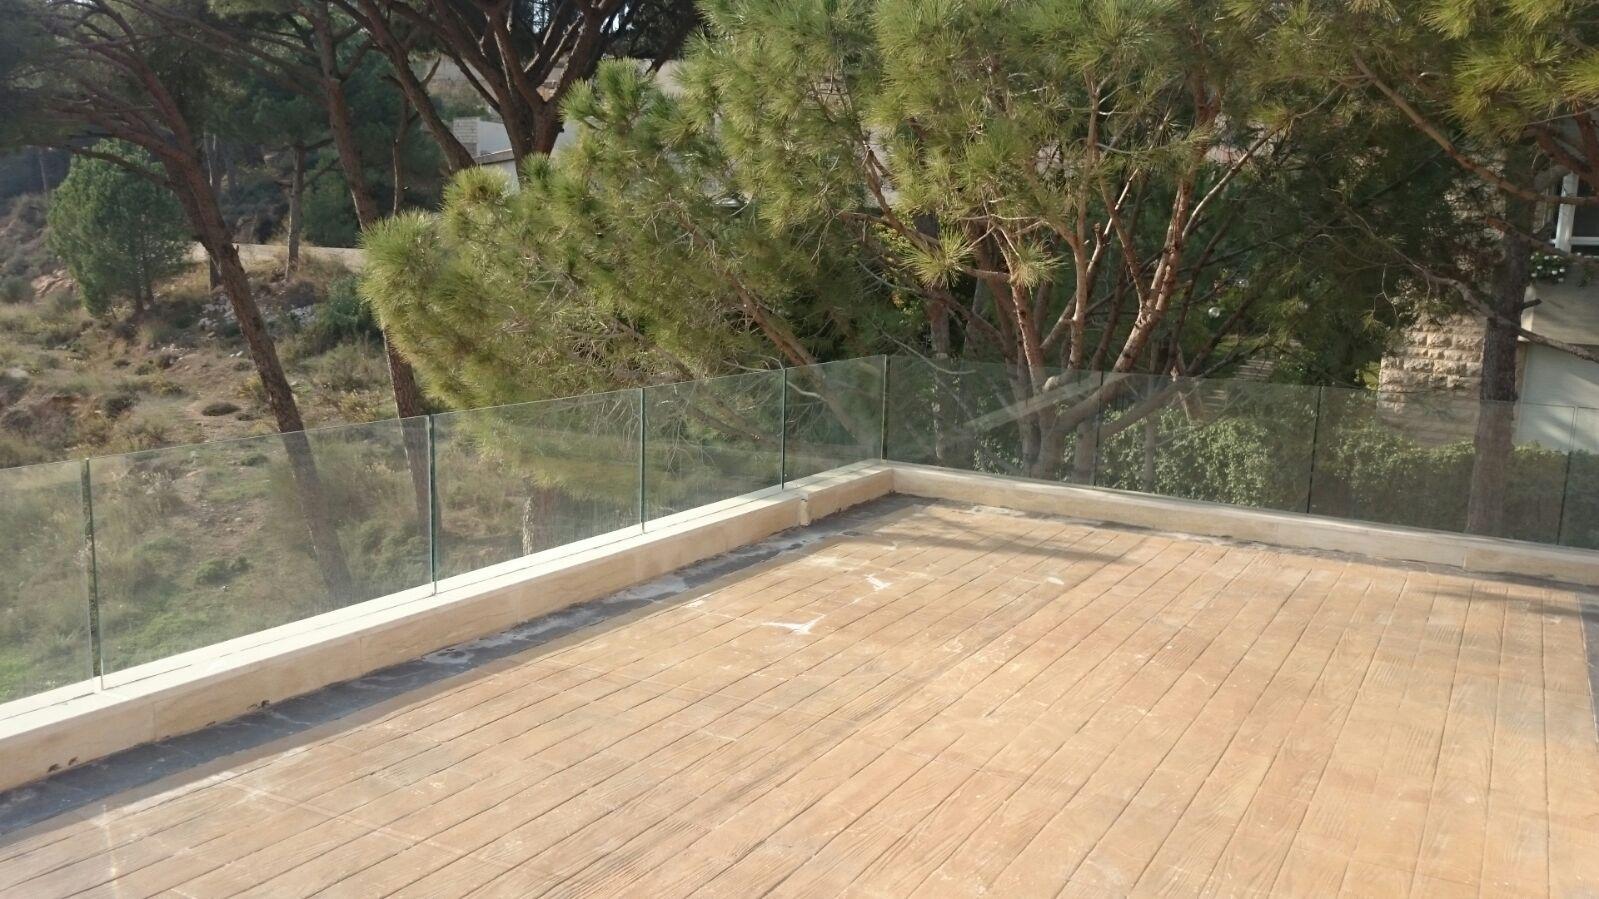 Mountain View Duplex For Sale In Baabdat